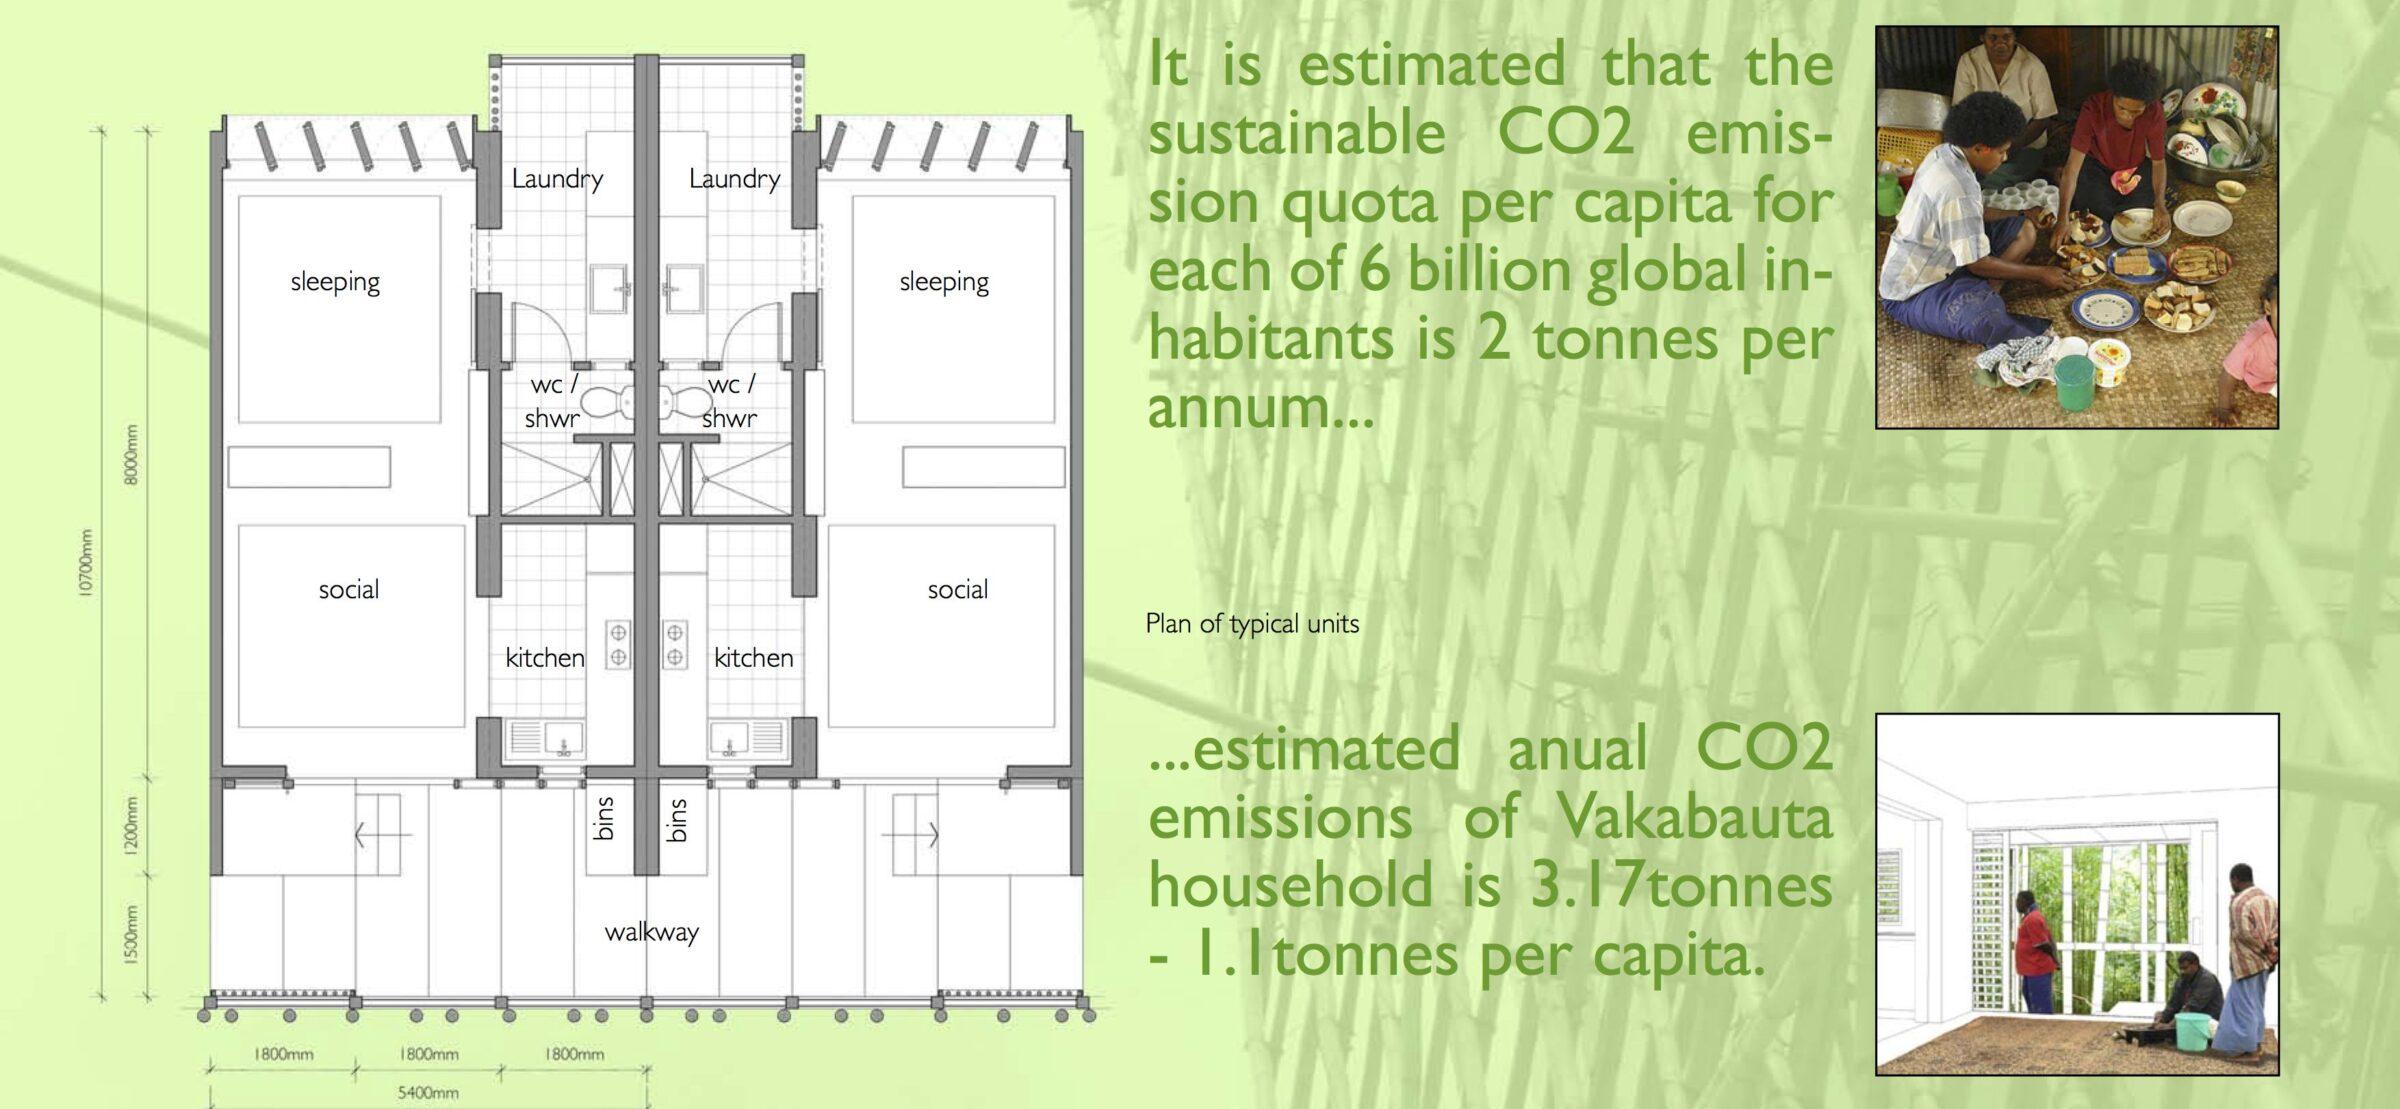 9-Bamboo-RIBA-Slides-LATEST-copy